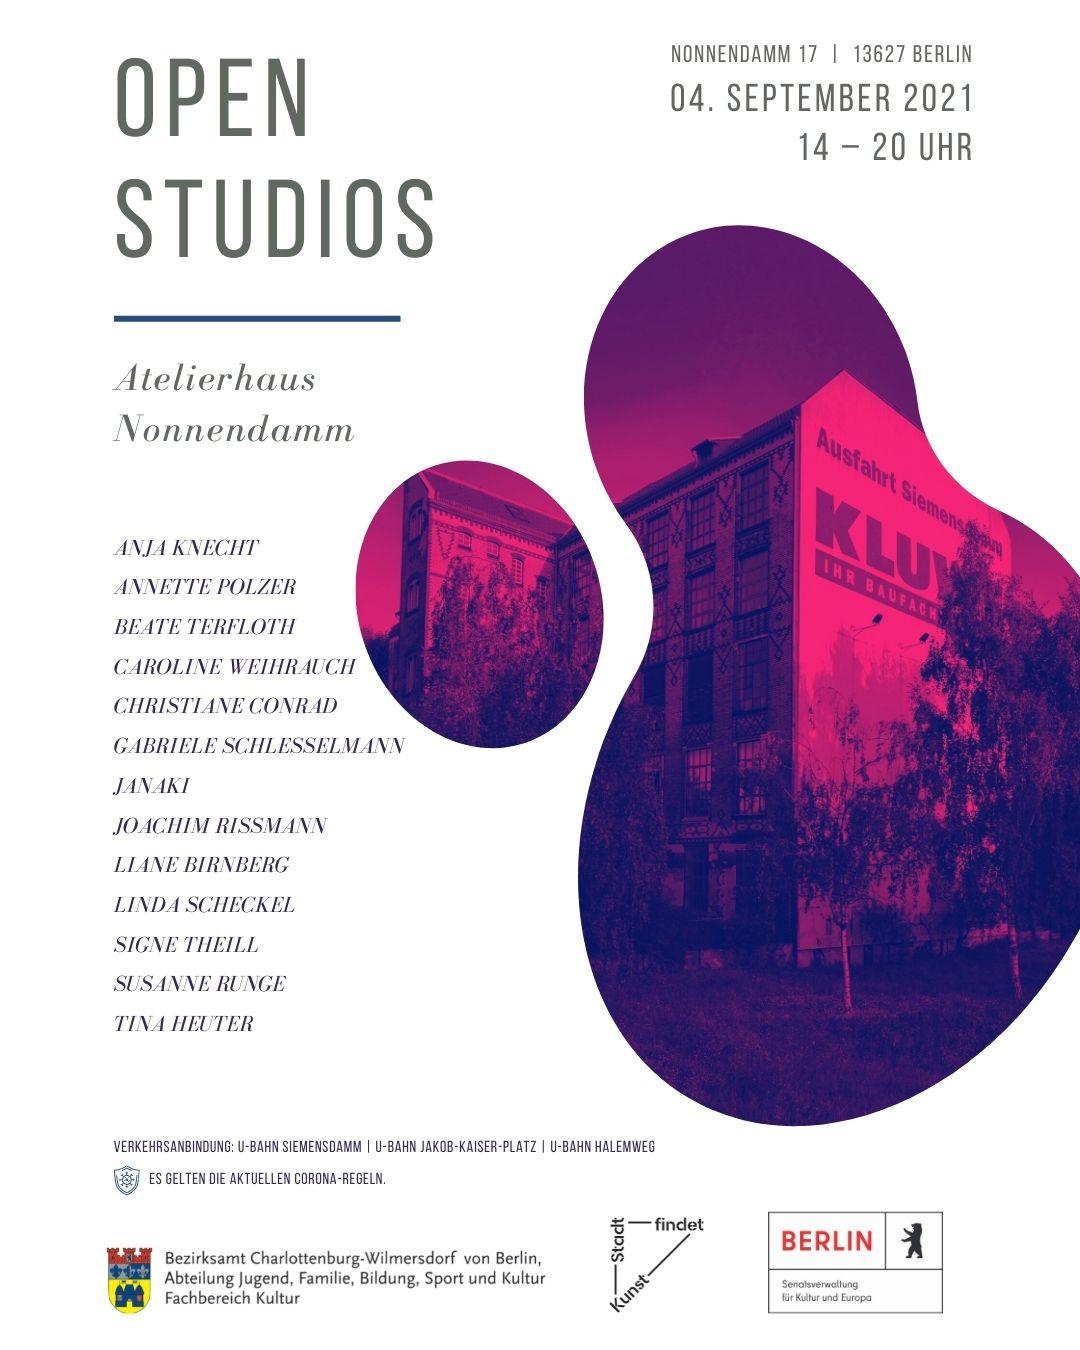 open studios – Atelierhaus Nonnendamm